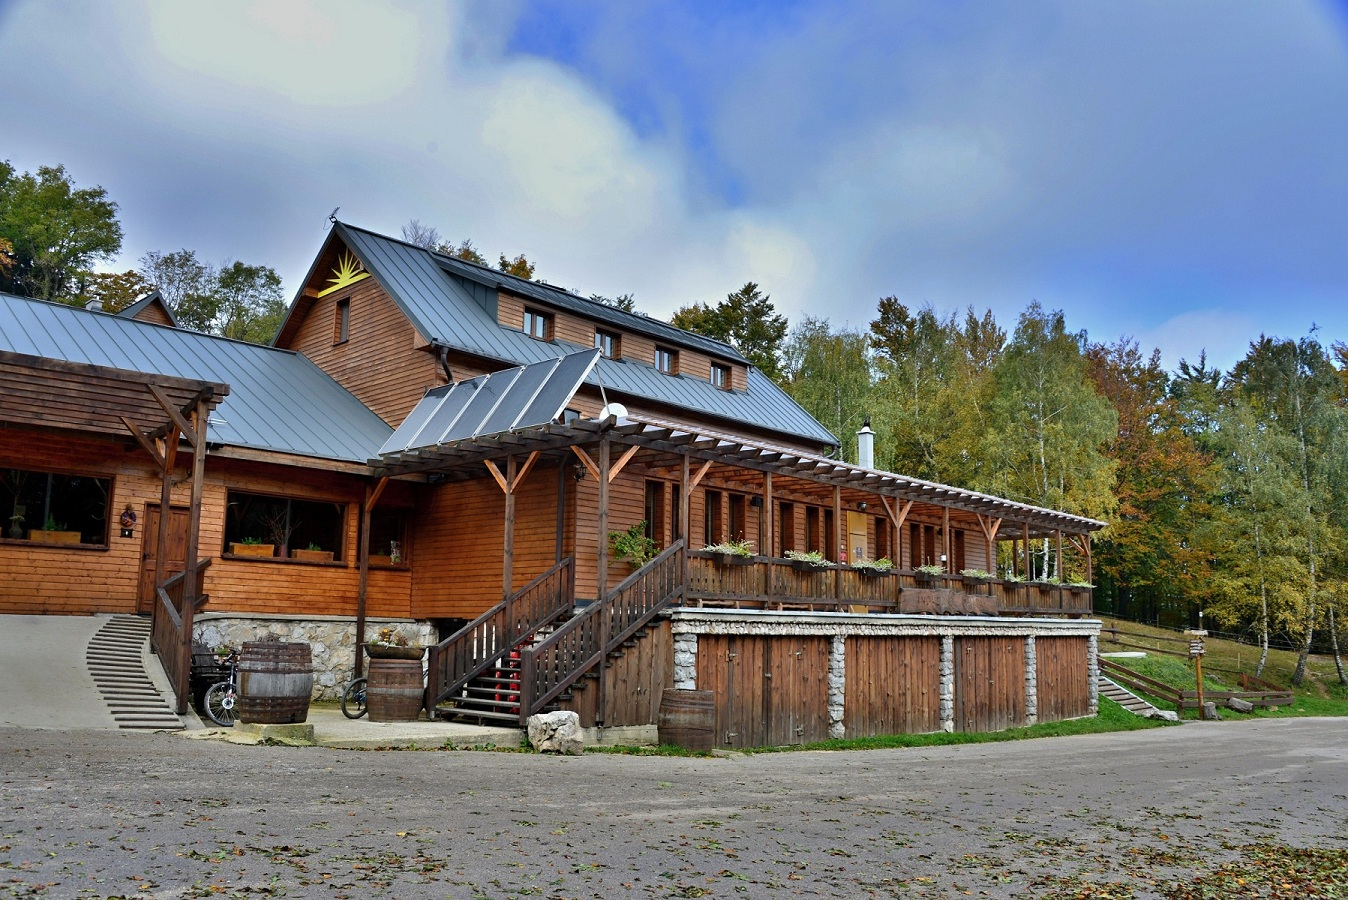 Chata pod Inovcom - zdroj: foto.turistika.cz